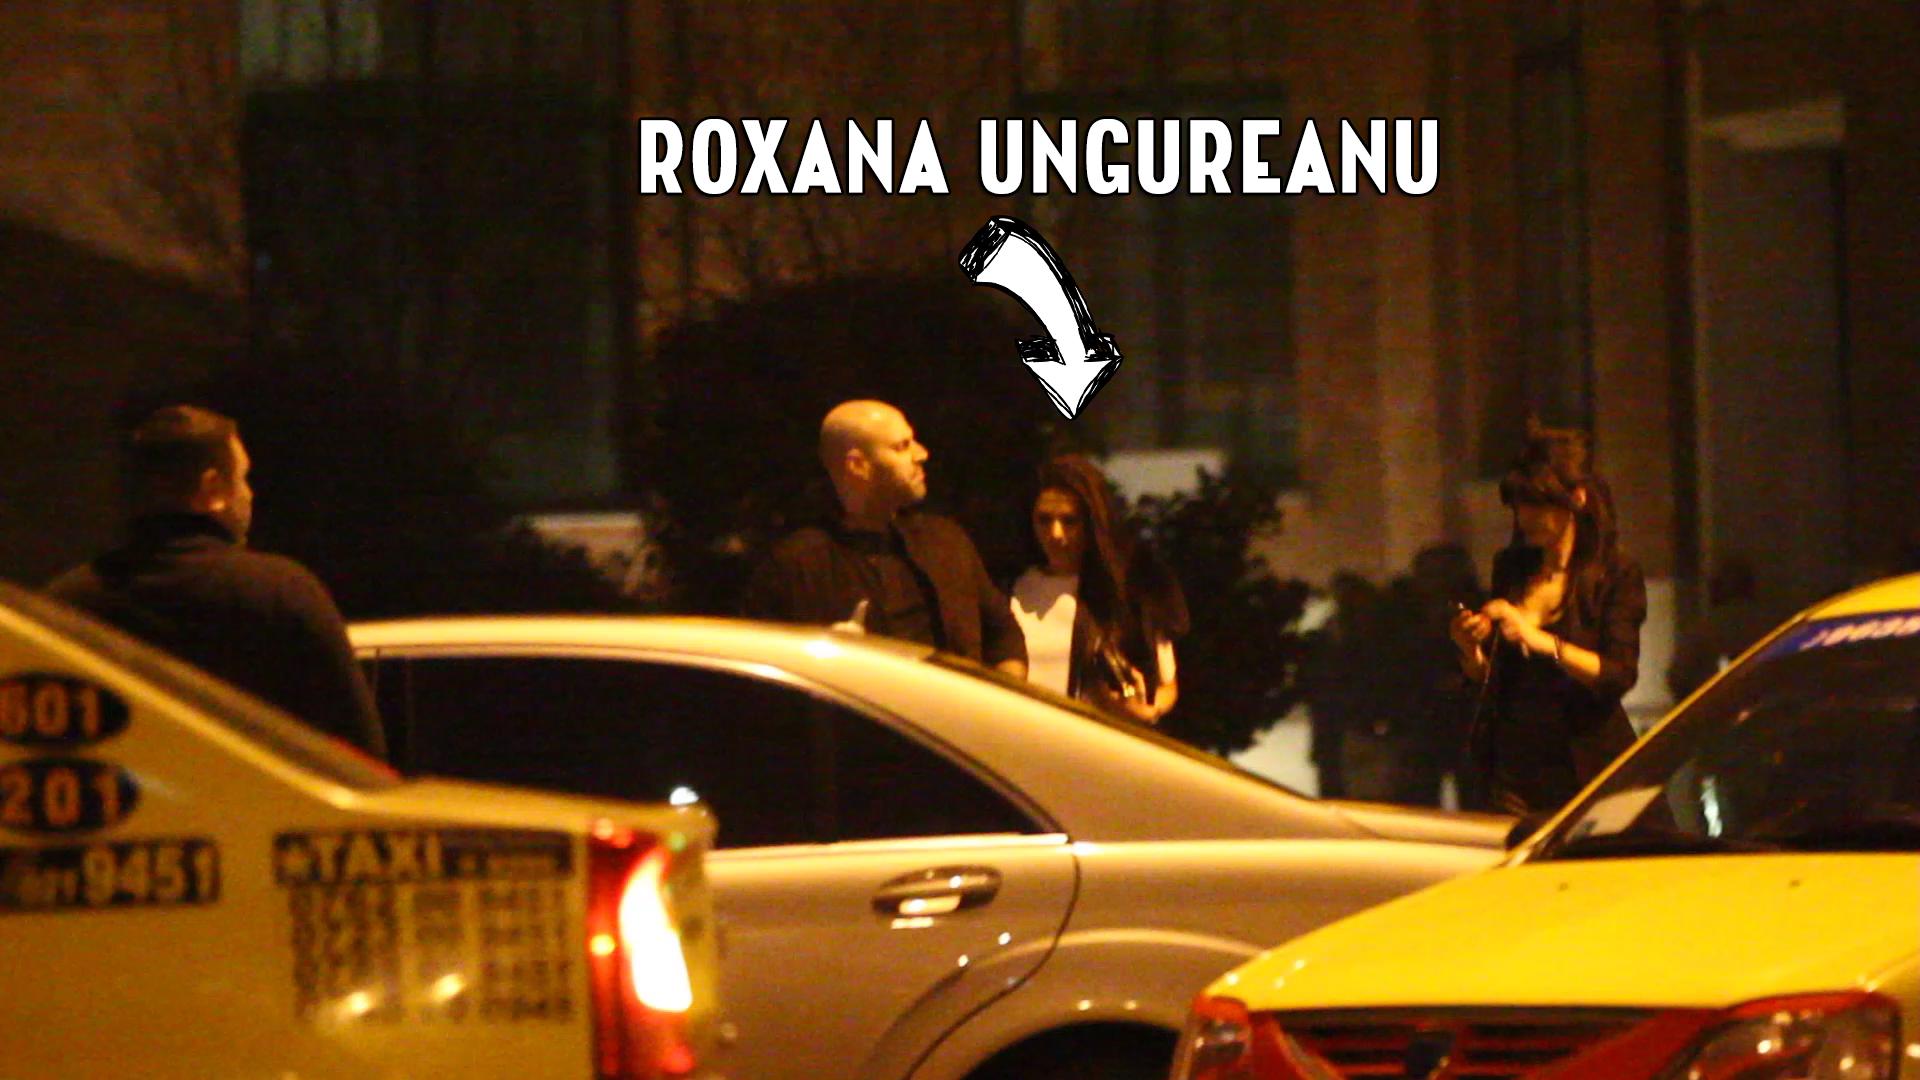 Nicola si Roxana Ungureanu au plecat din club si s-au dus direct la el acasa